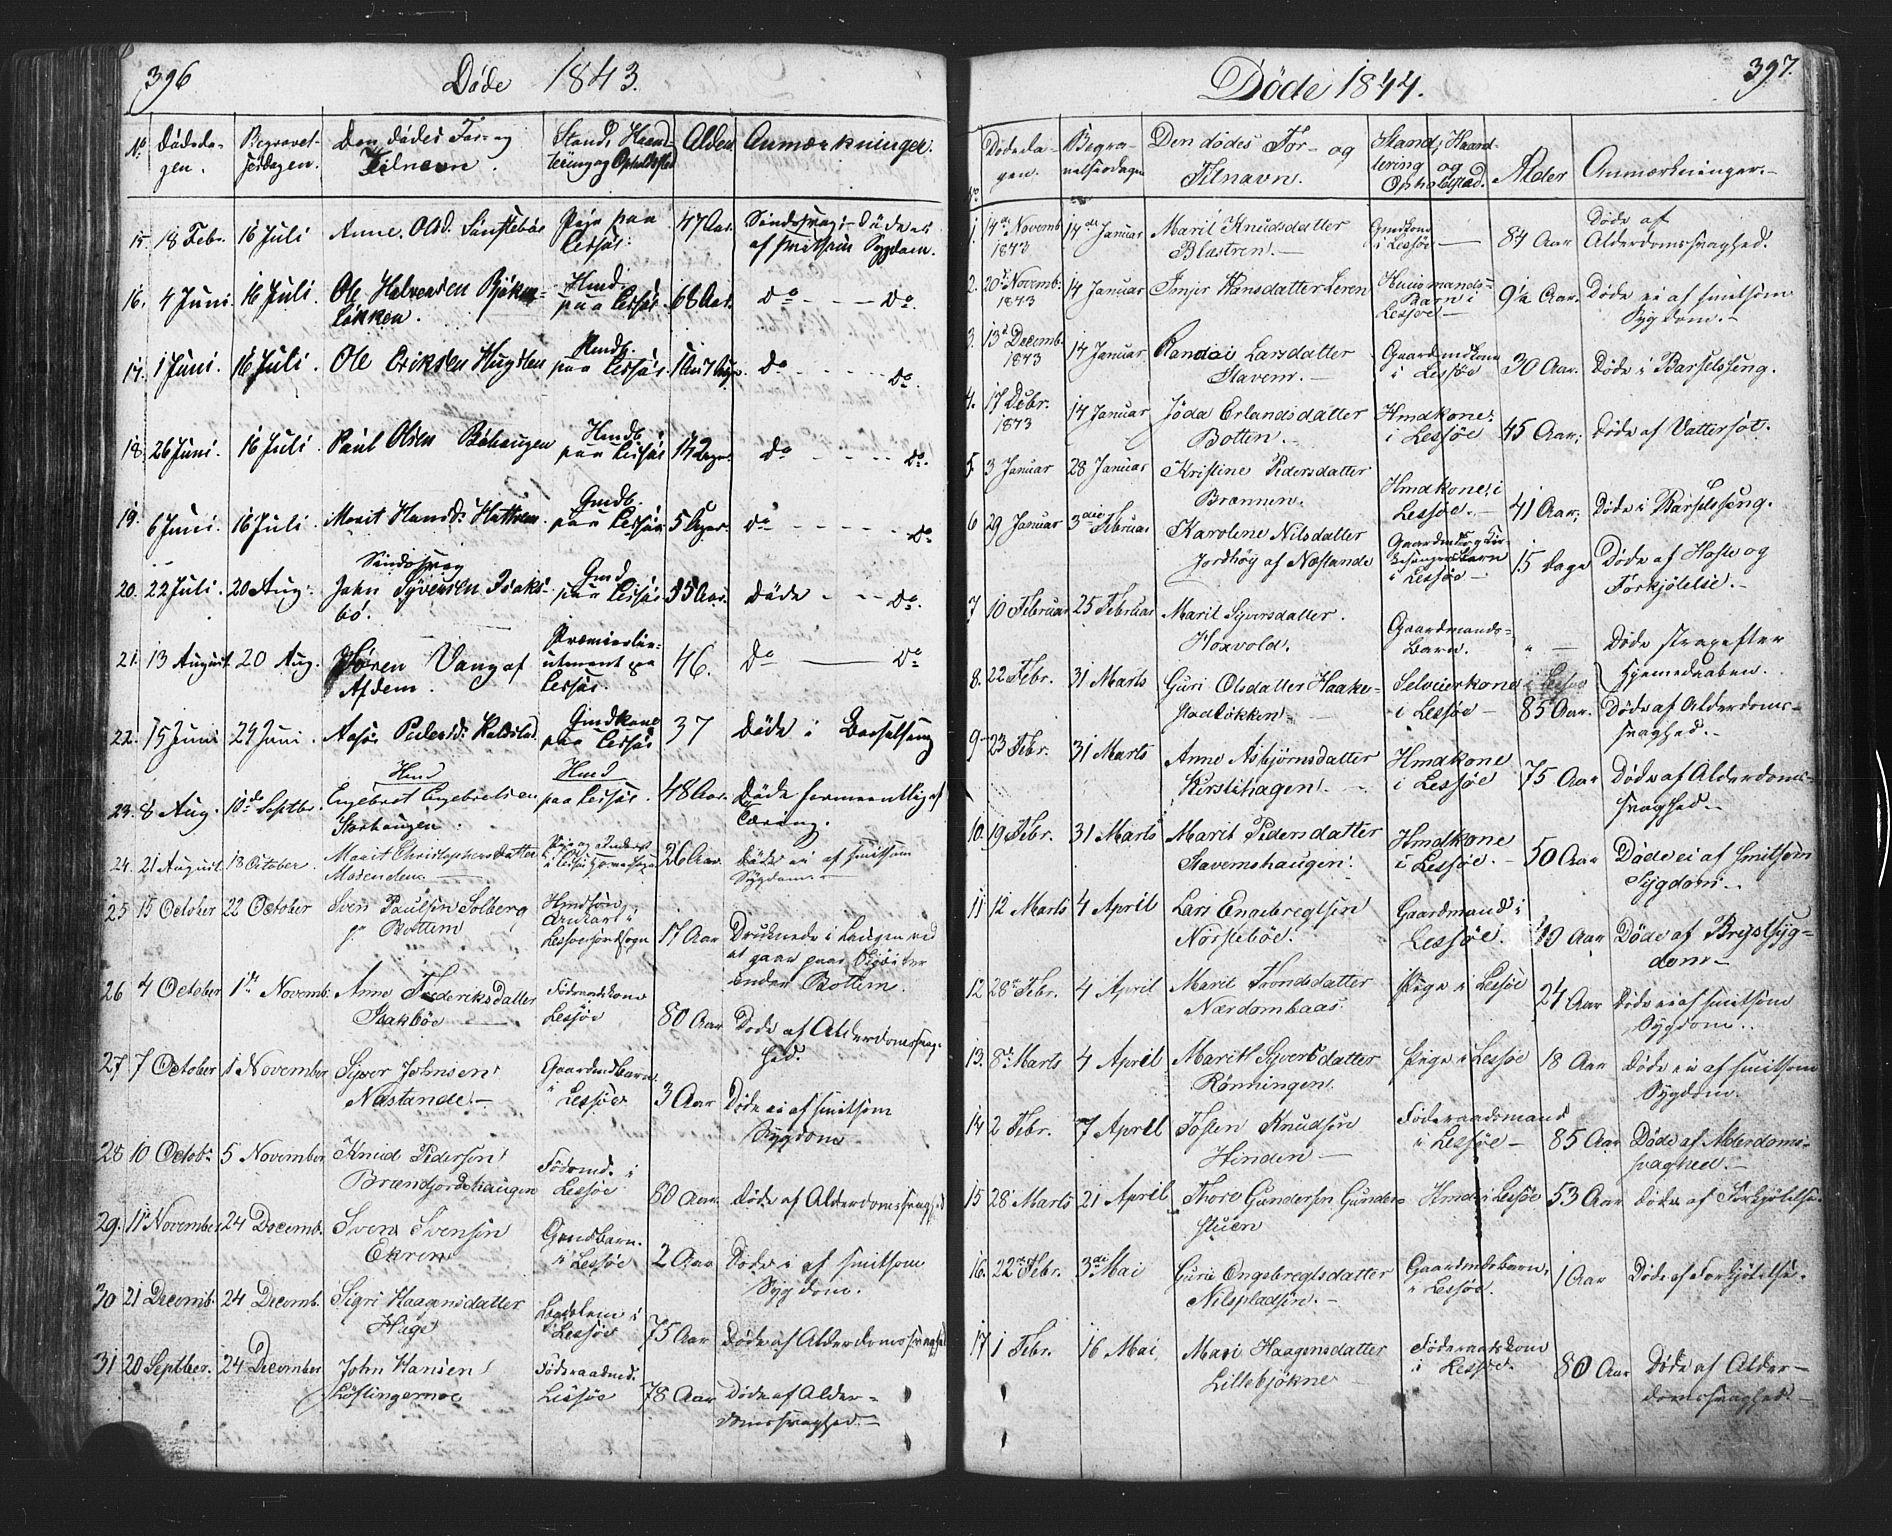 SAH, Lesja prestekontor, Klokkerbok nr. 2, 1832-1850, s. 396-397